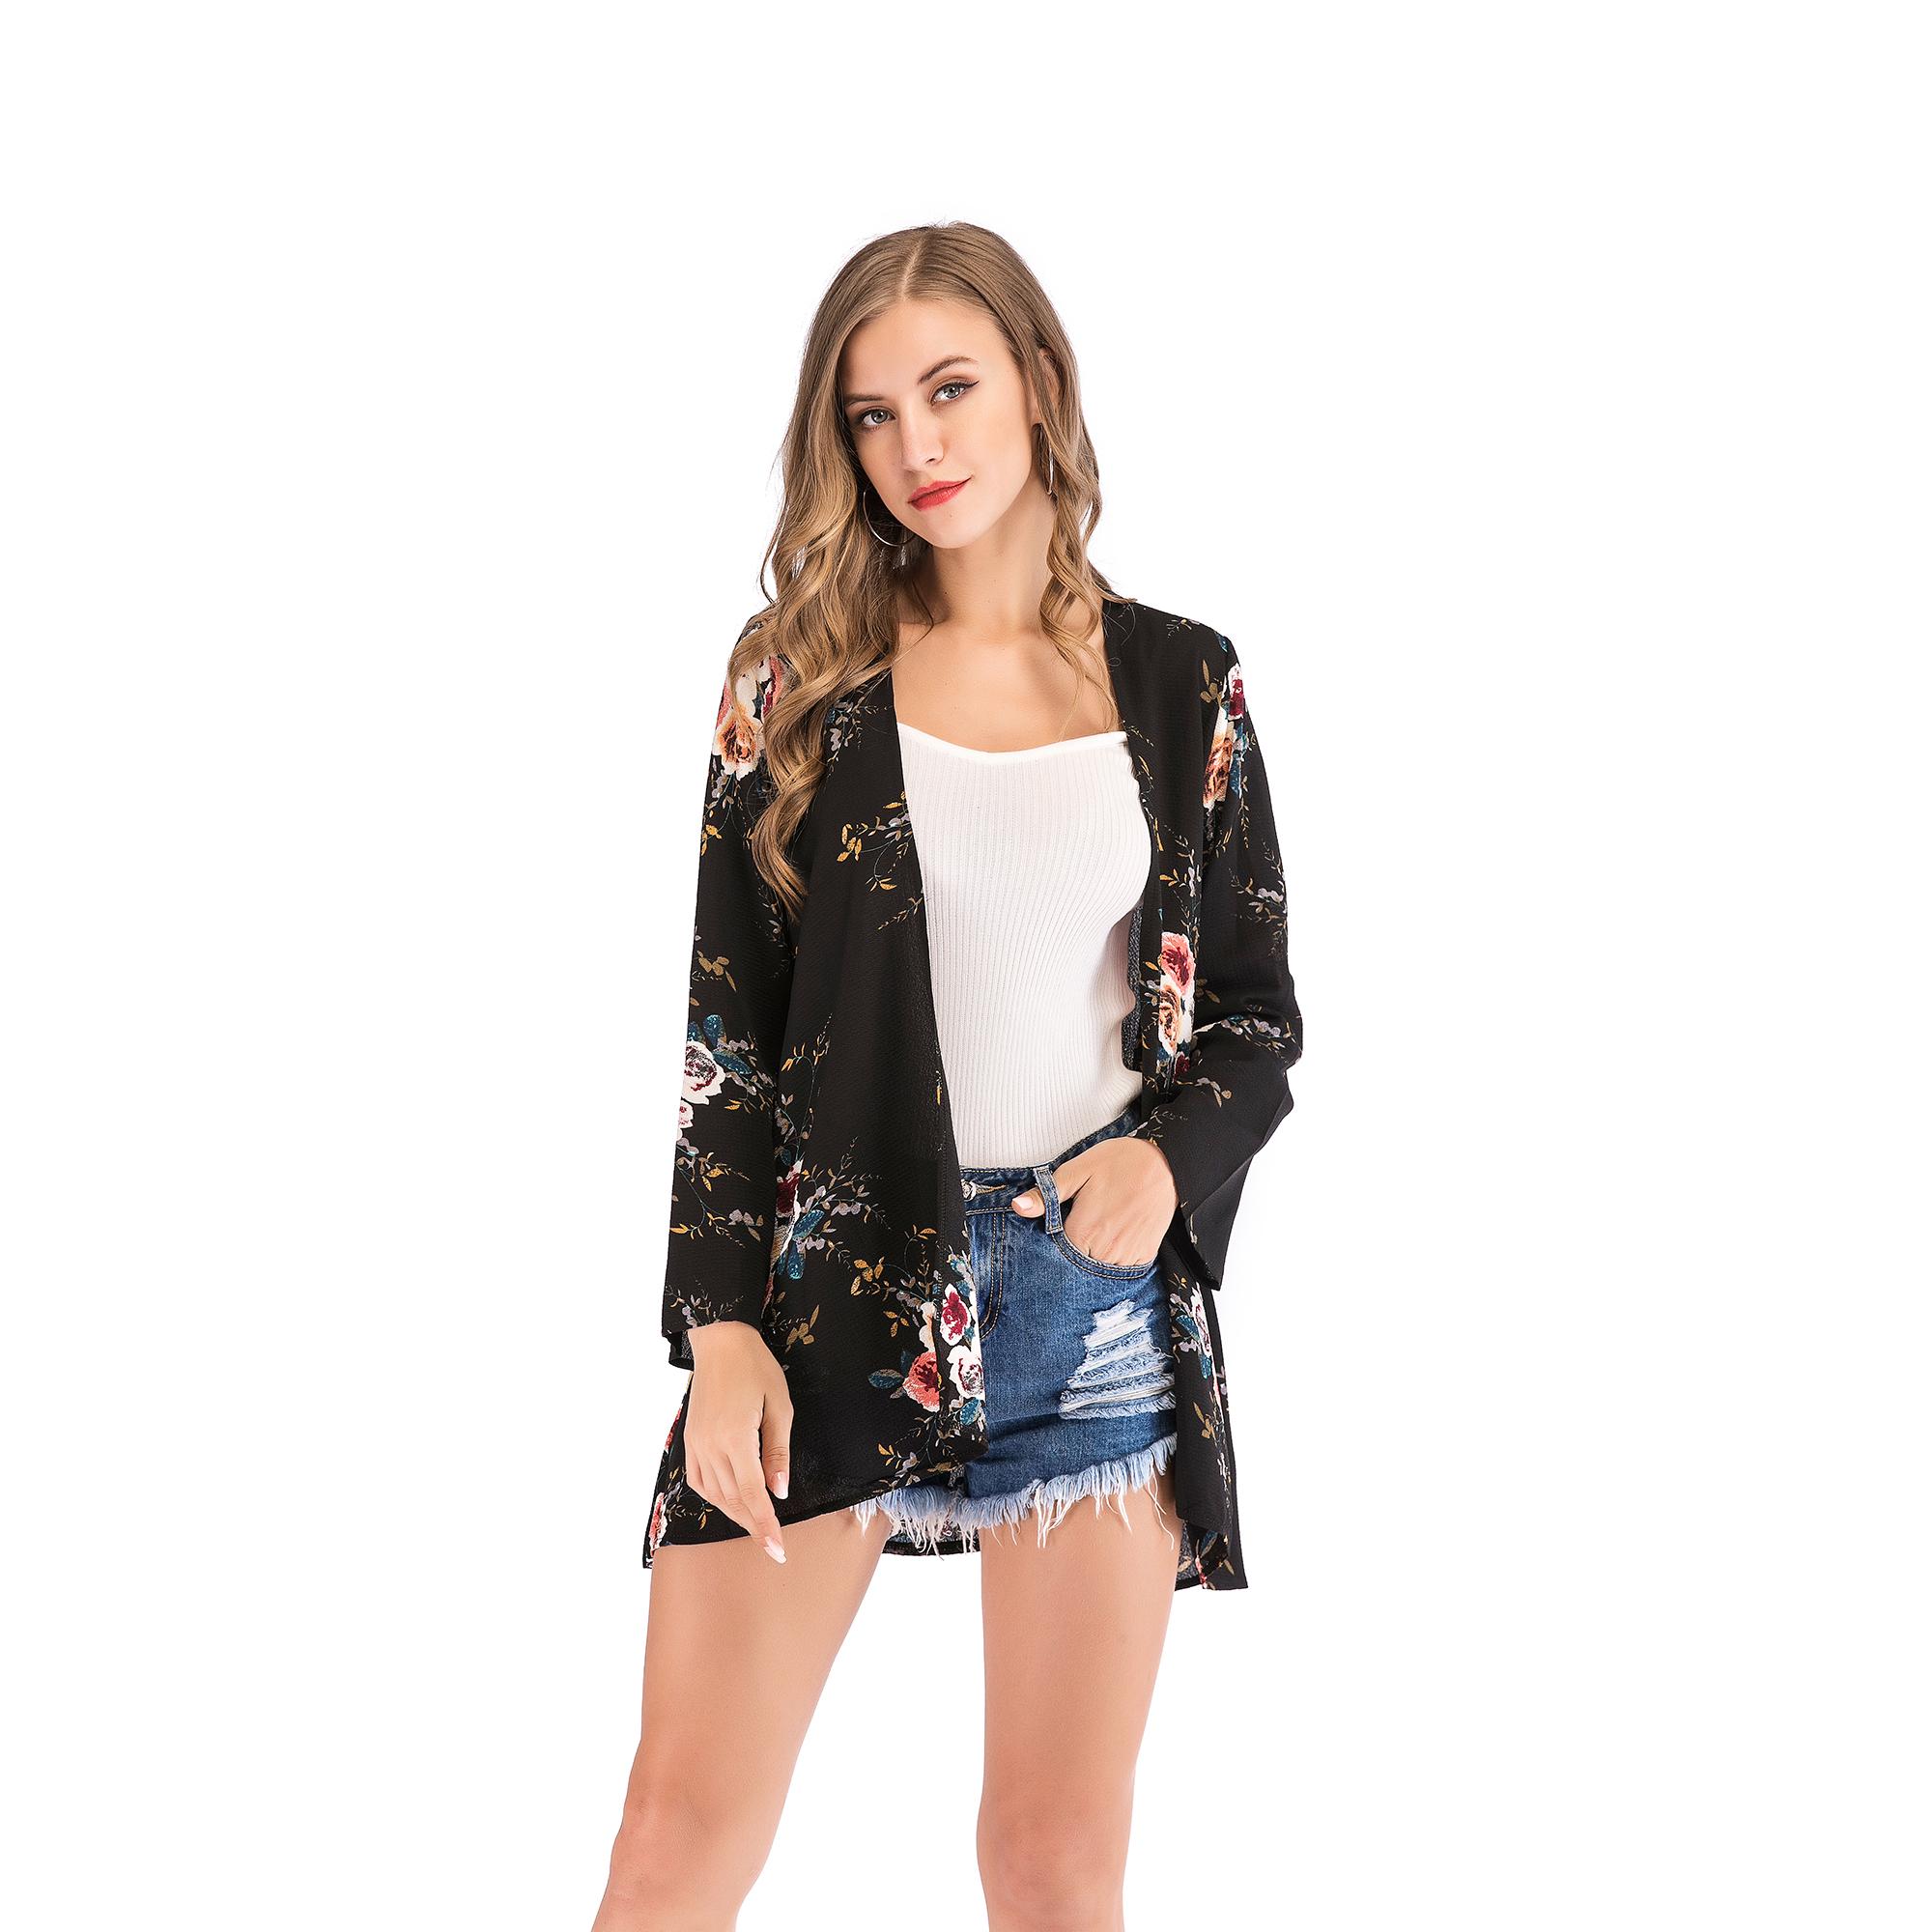 Fashion-Women-Loose-Blouse-Kimono-Cardigan-Tops-Summer-Bikini-Cover-Up-Wrap-Coat thumbnail 16